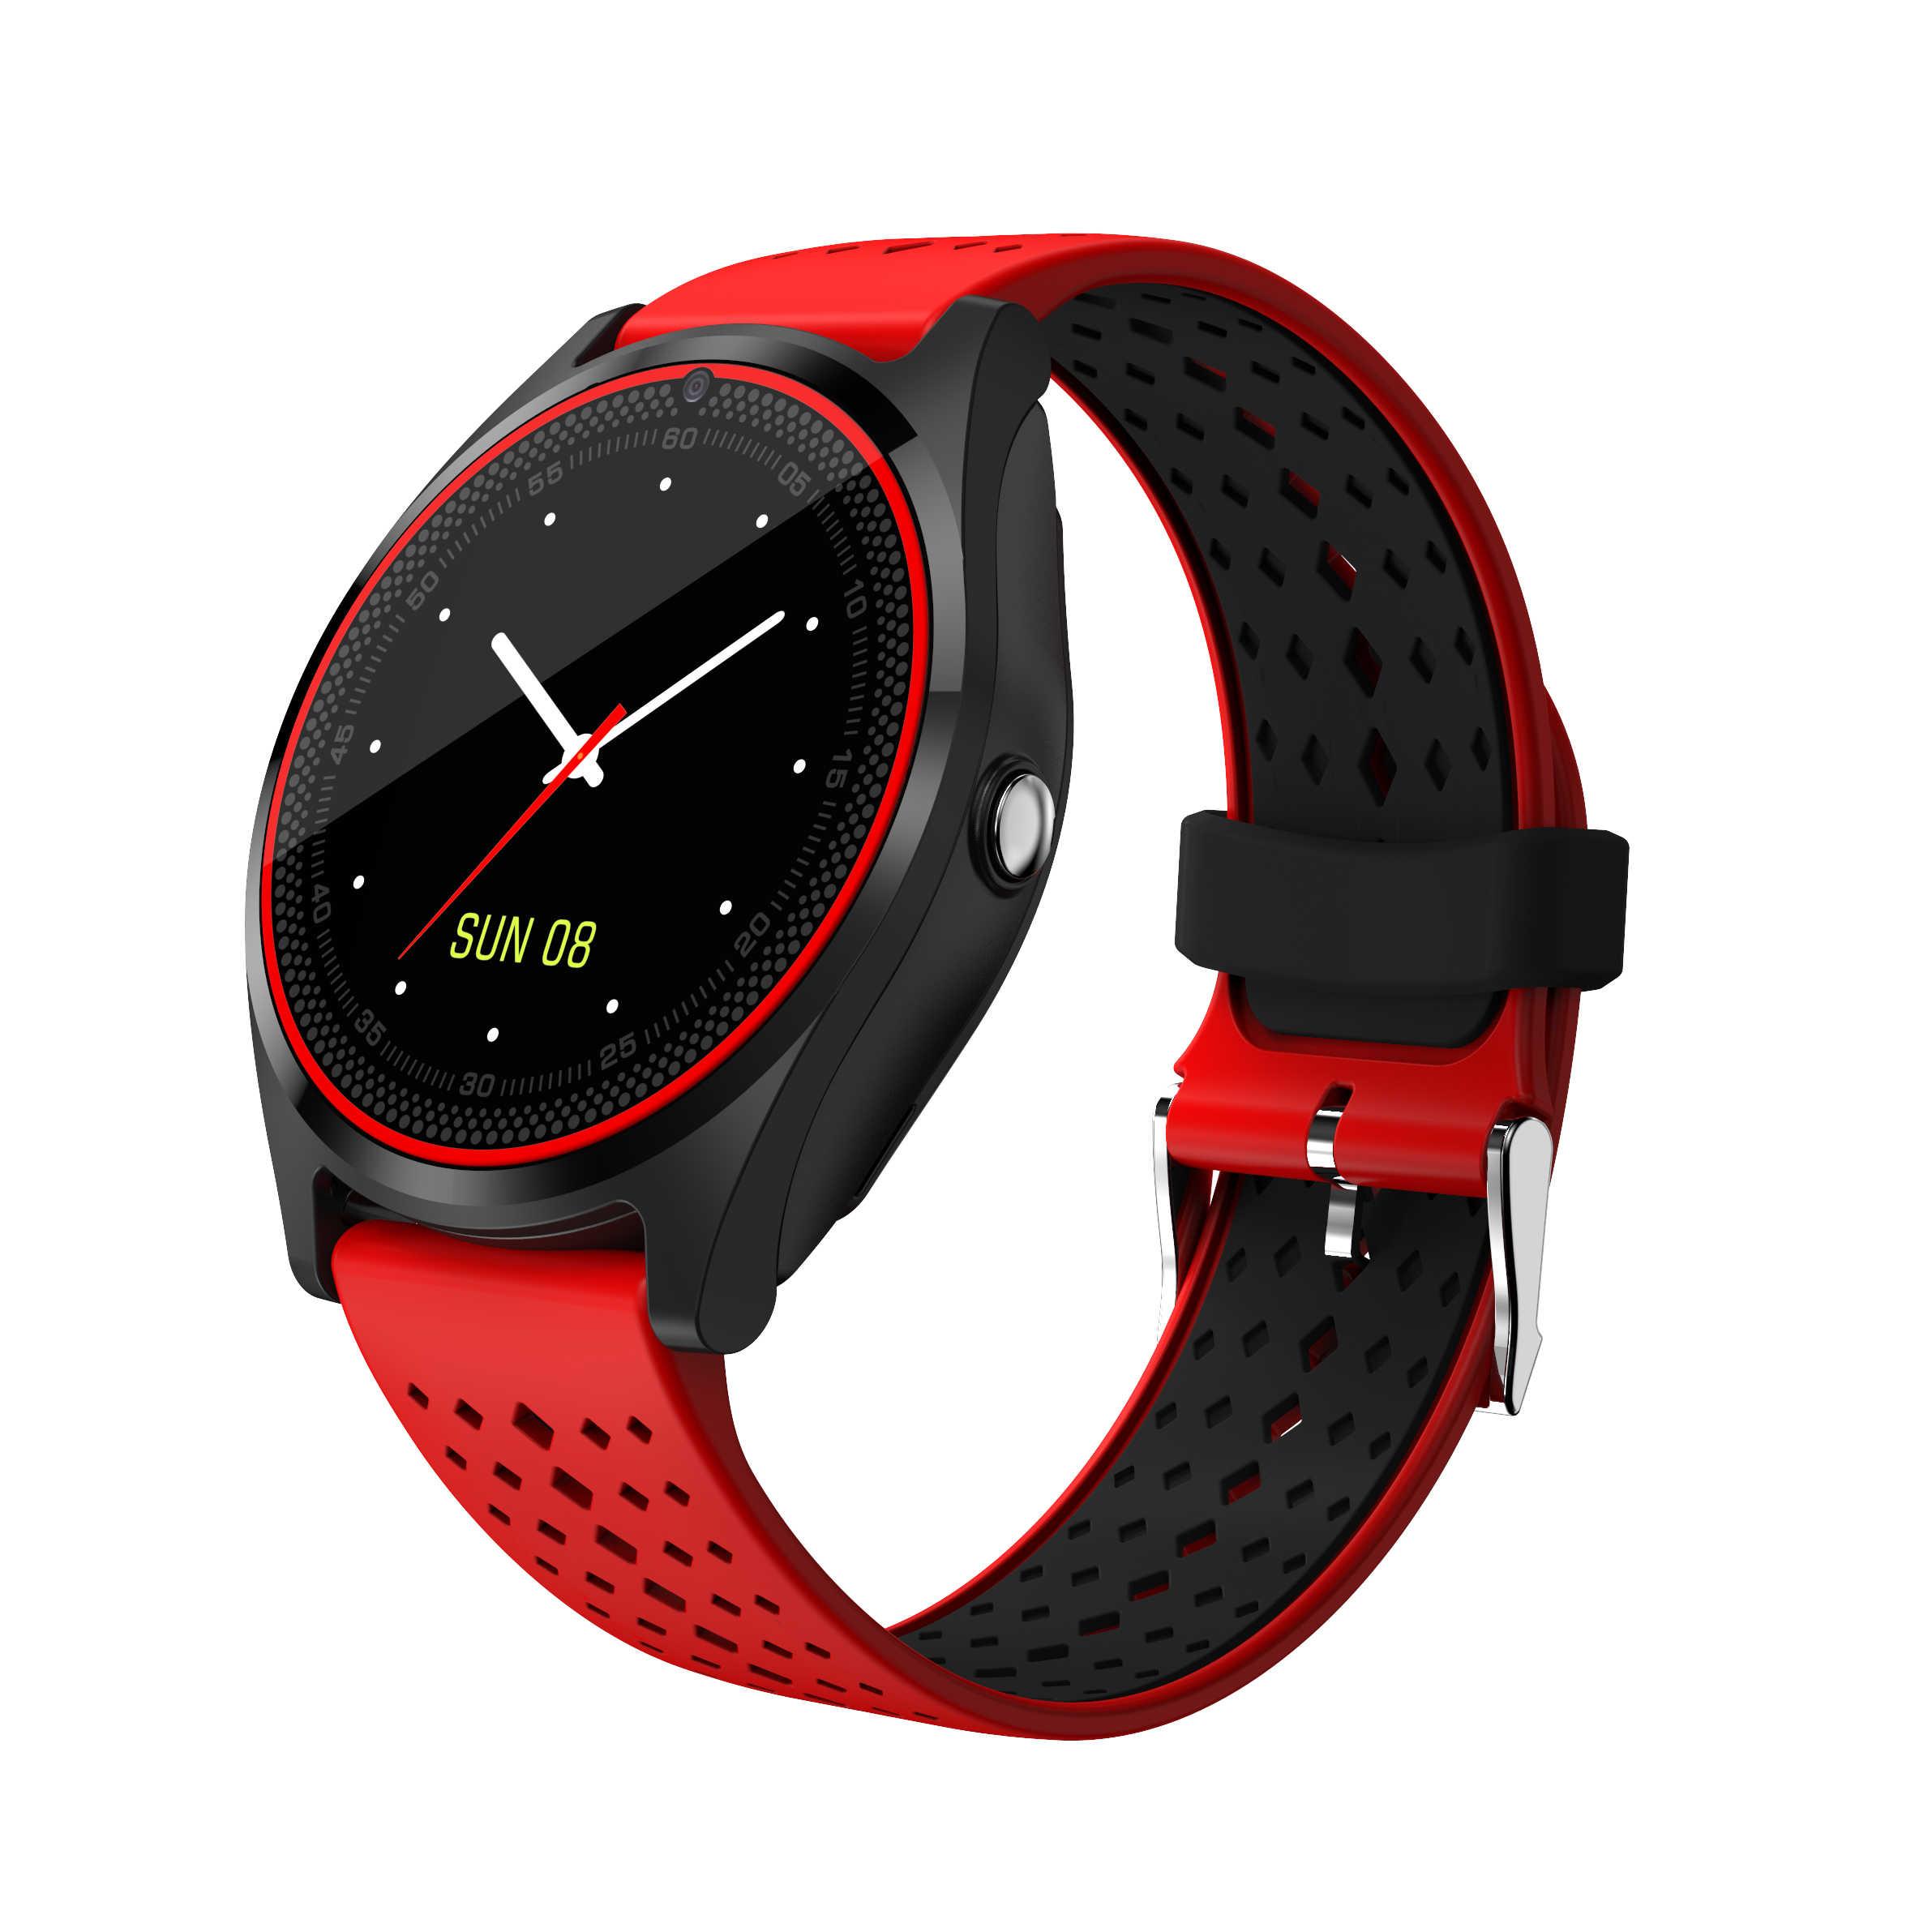 V9 Smart Watch Mendukung Kamera Bluetooth Smartwatch SIM Kartu Jam Tangan untuk Pria Wanita Anak Wearable Perangkat Olahraga Watch